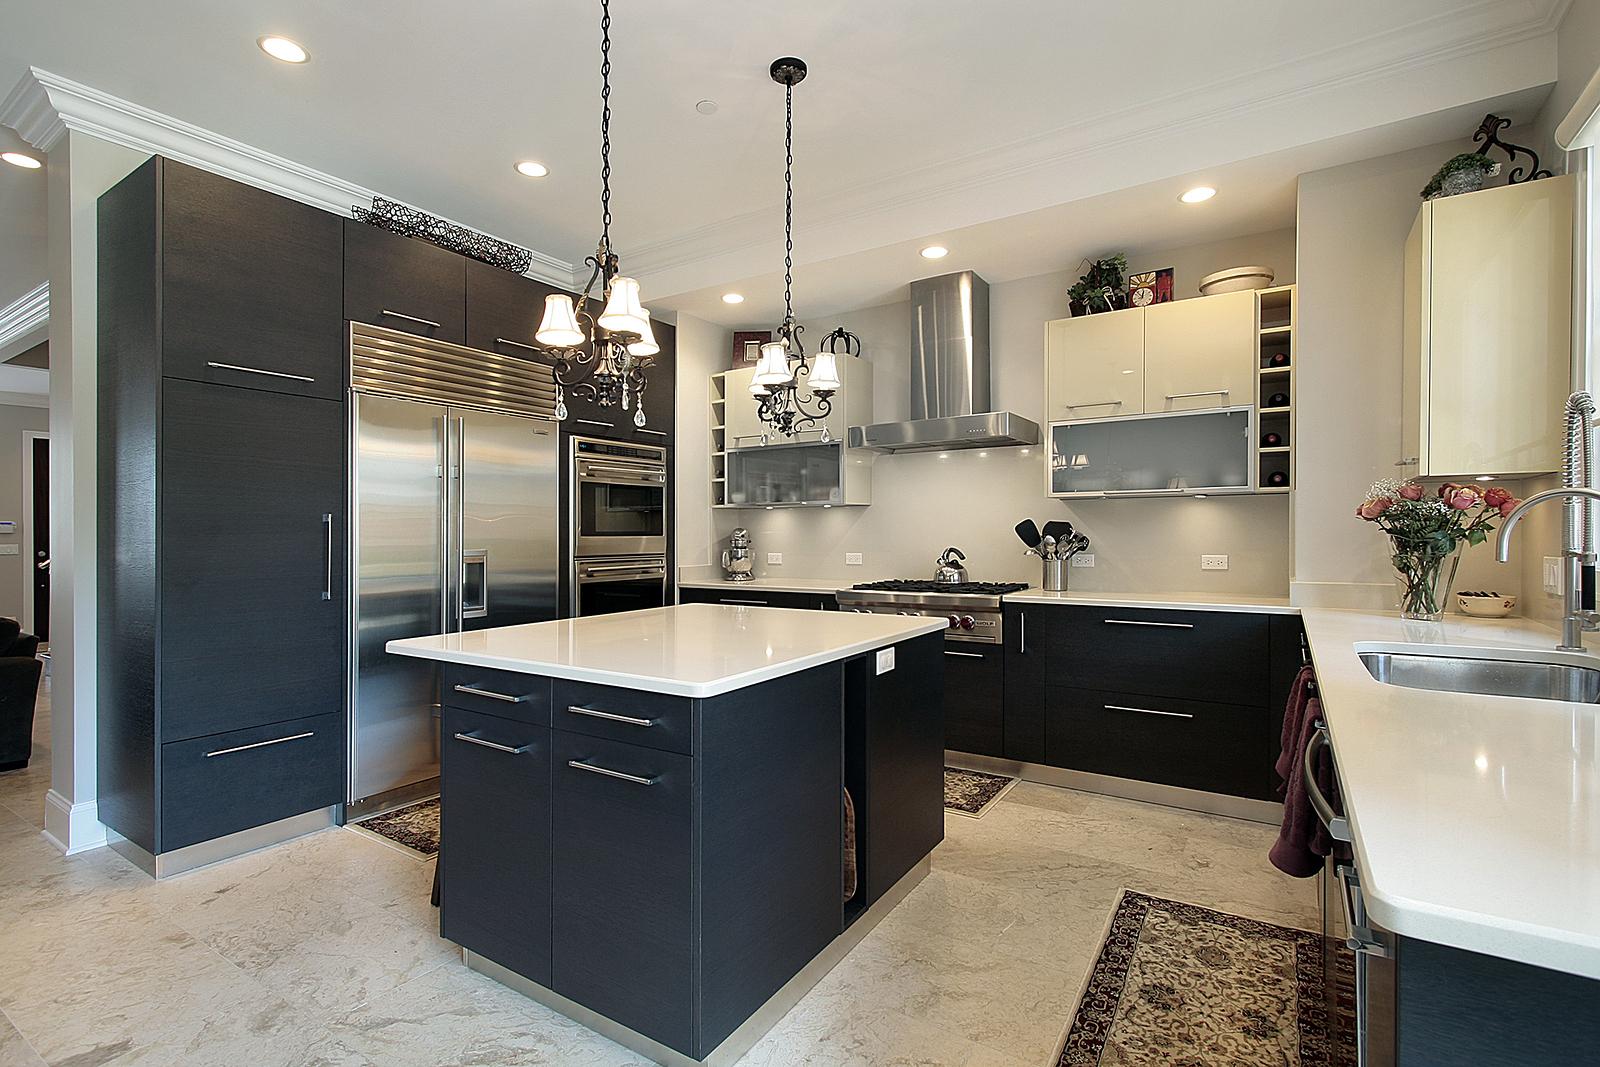 bigstock-Kitchen-With-Black-Cabinets-5118439.jpg